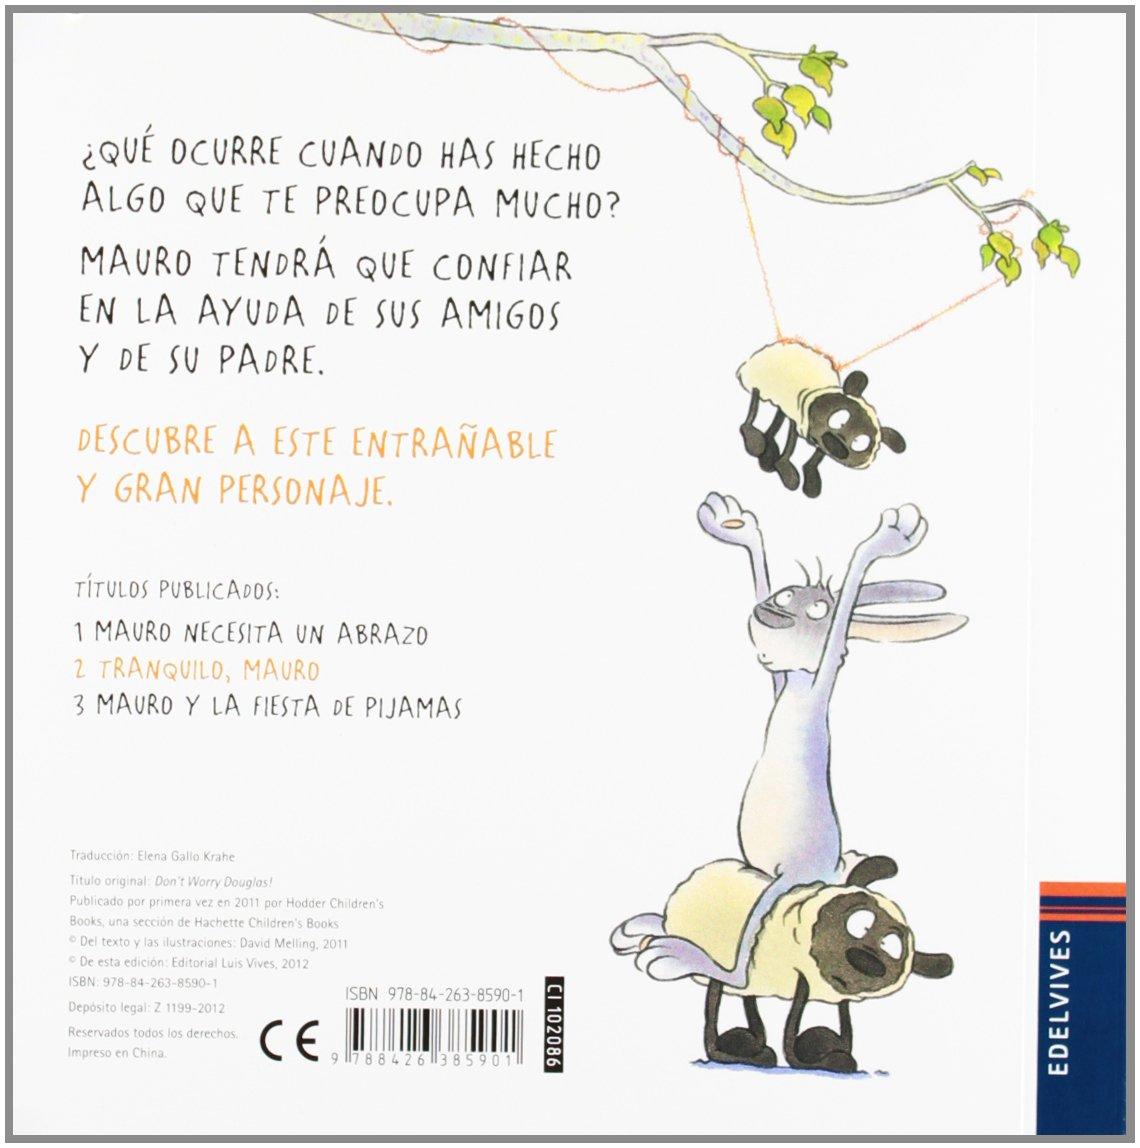 Tranquilo, Mauro / Quiet, Mauro (Spanish Edition): David Melling: 9788426385901: Amazon.com: Books